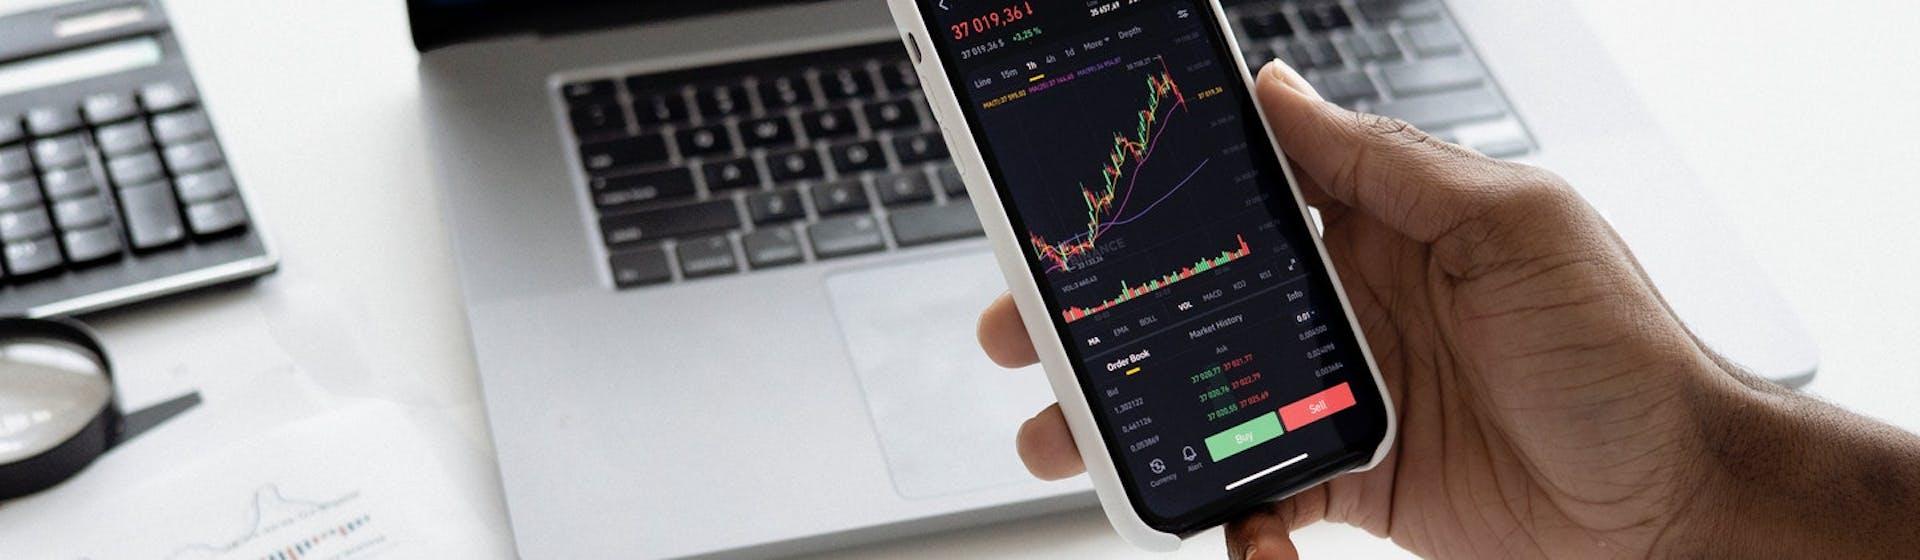 Airtm: la plataforma que mantendrá a salvo tus divisas